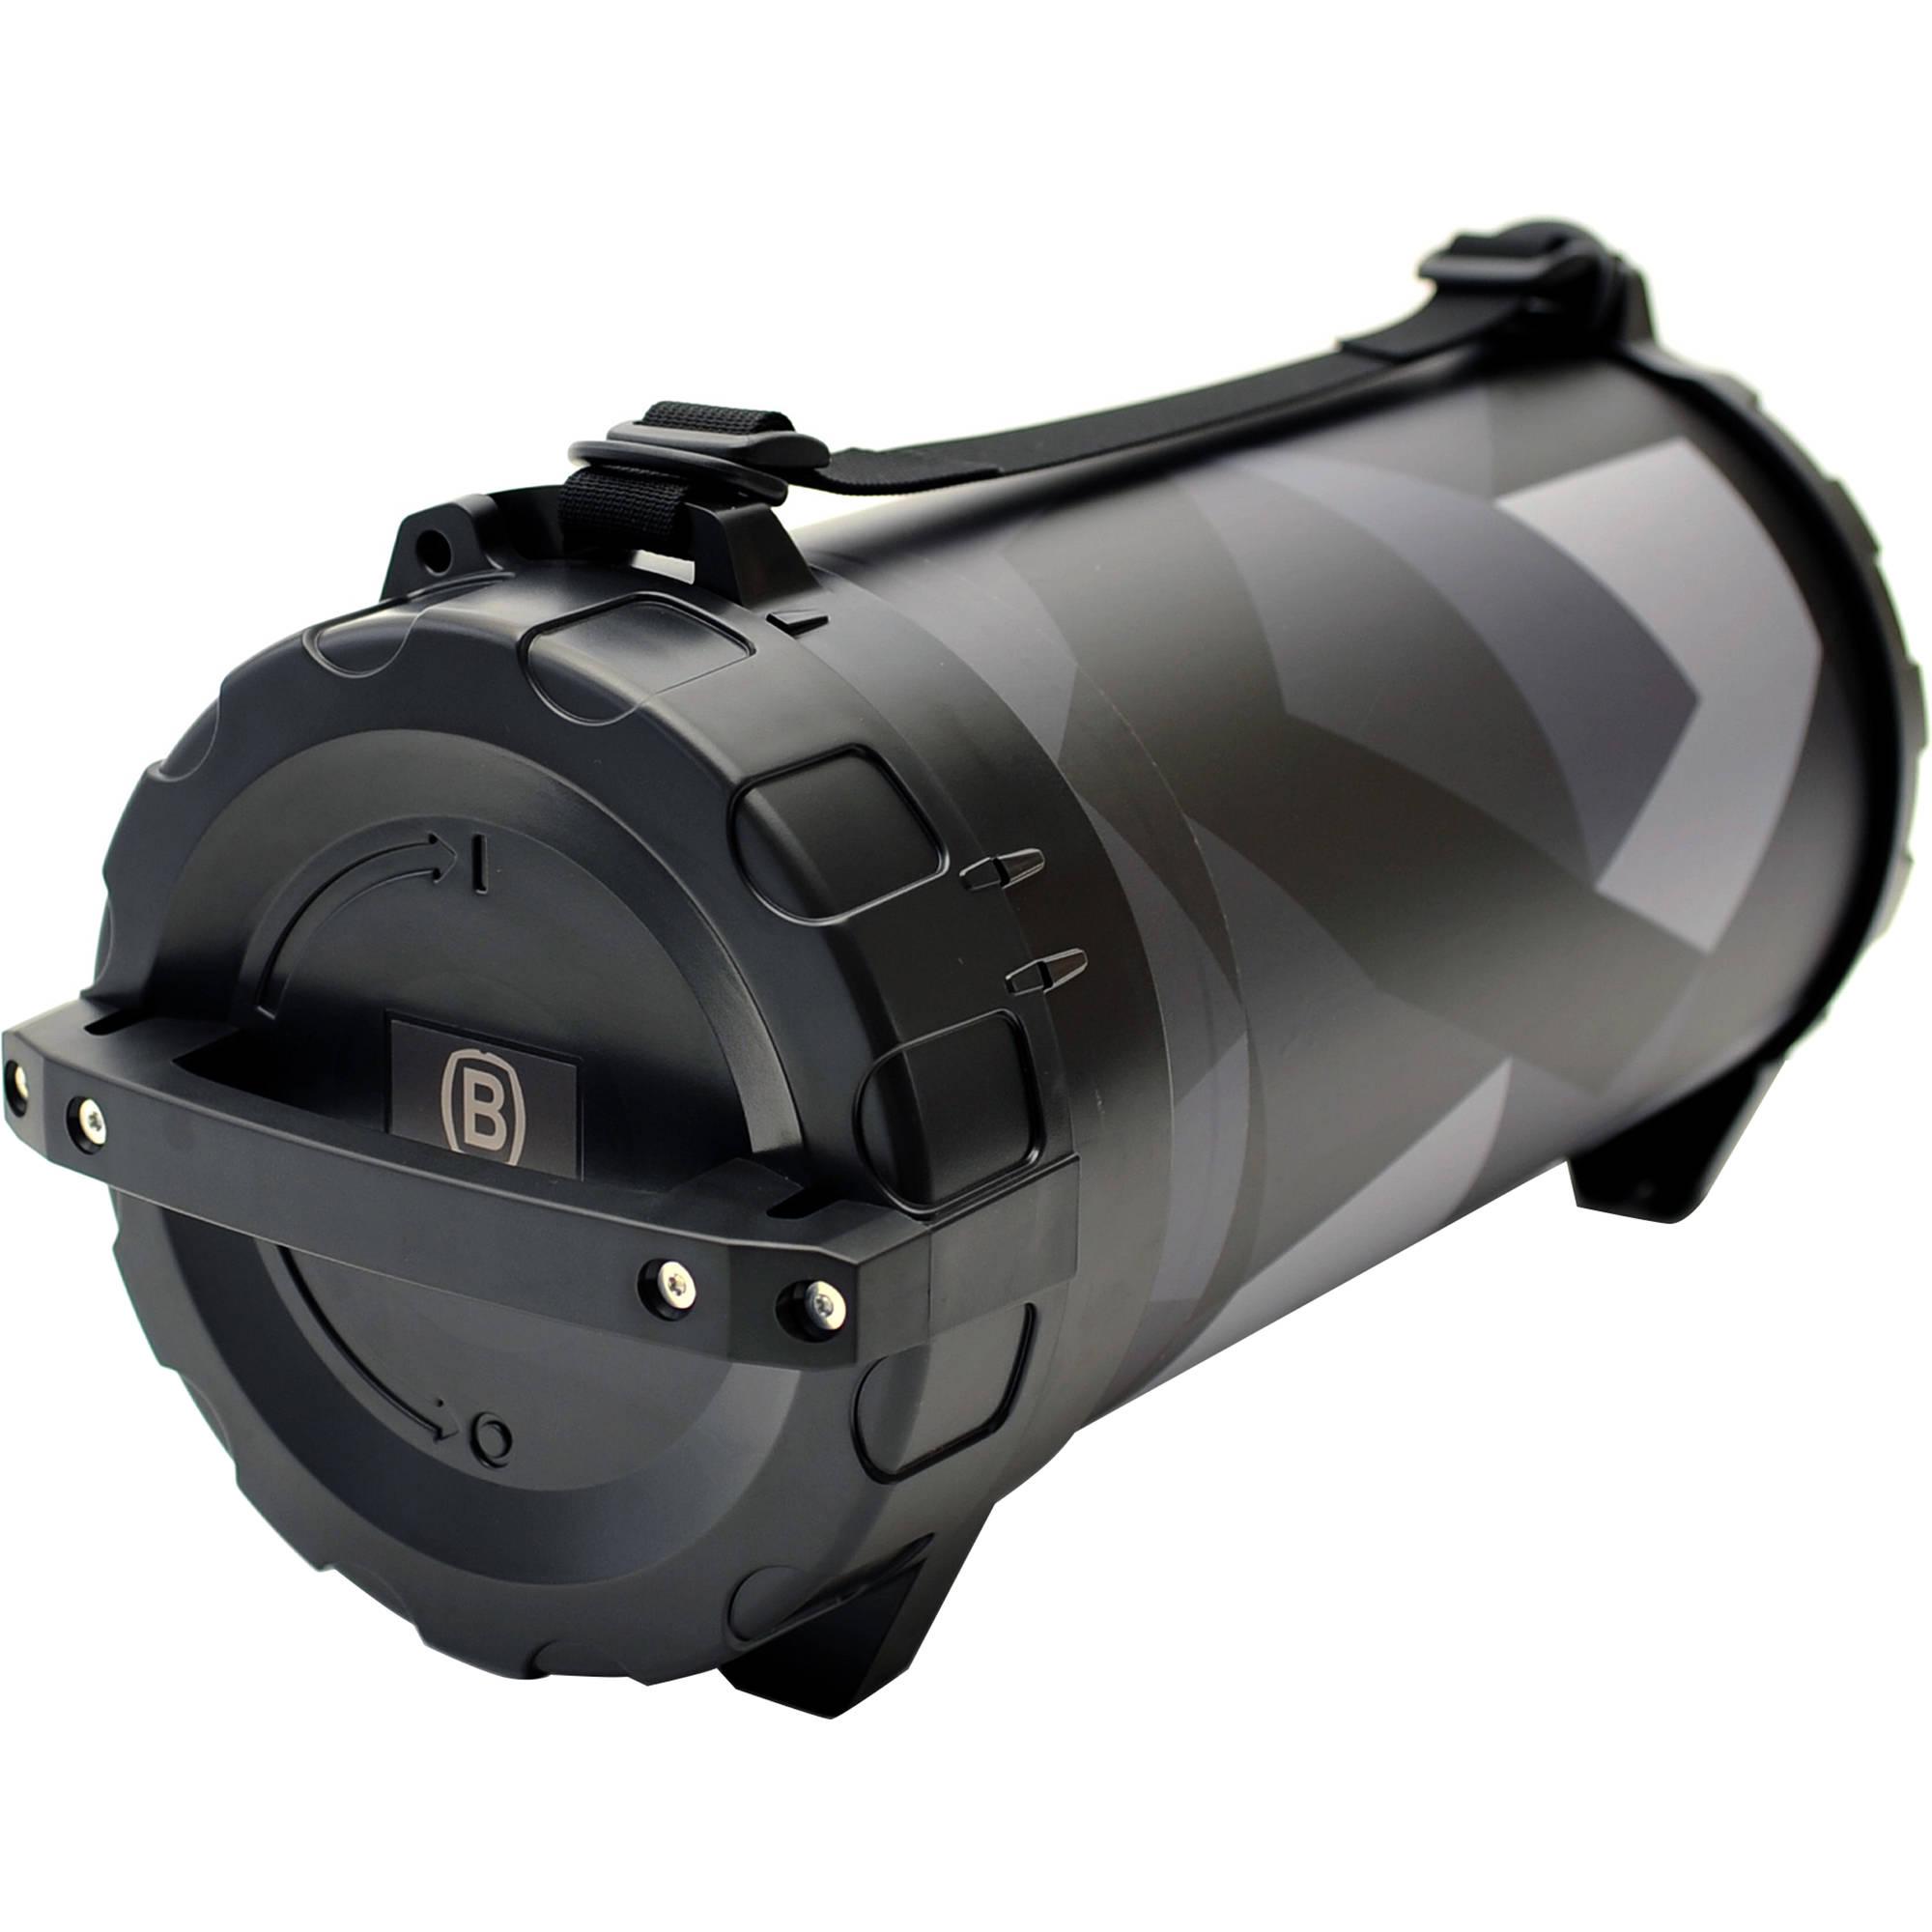 b0c313b7912e4 Beta Shell Series 6 Protective Lens Case BS6300-B1 B&H Photo